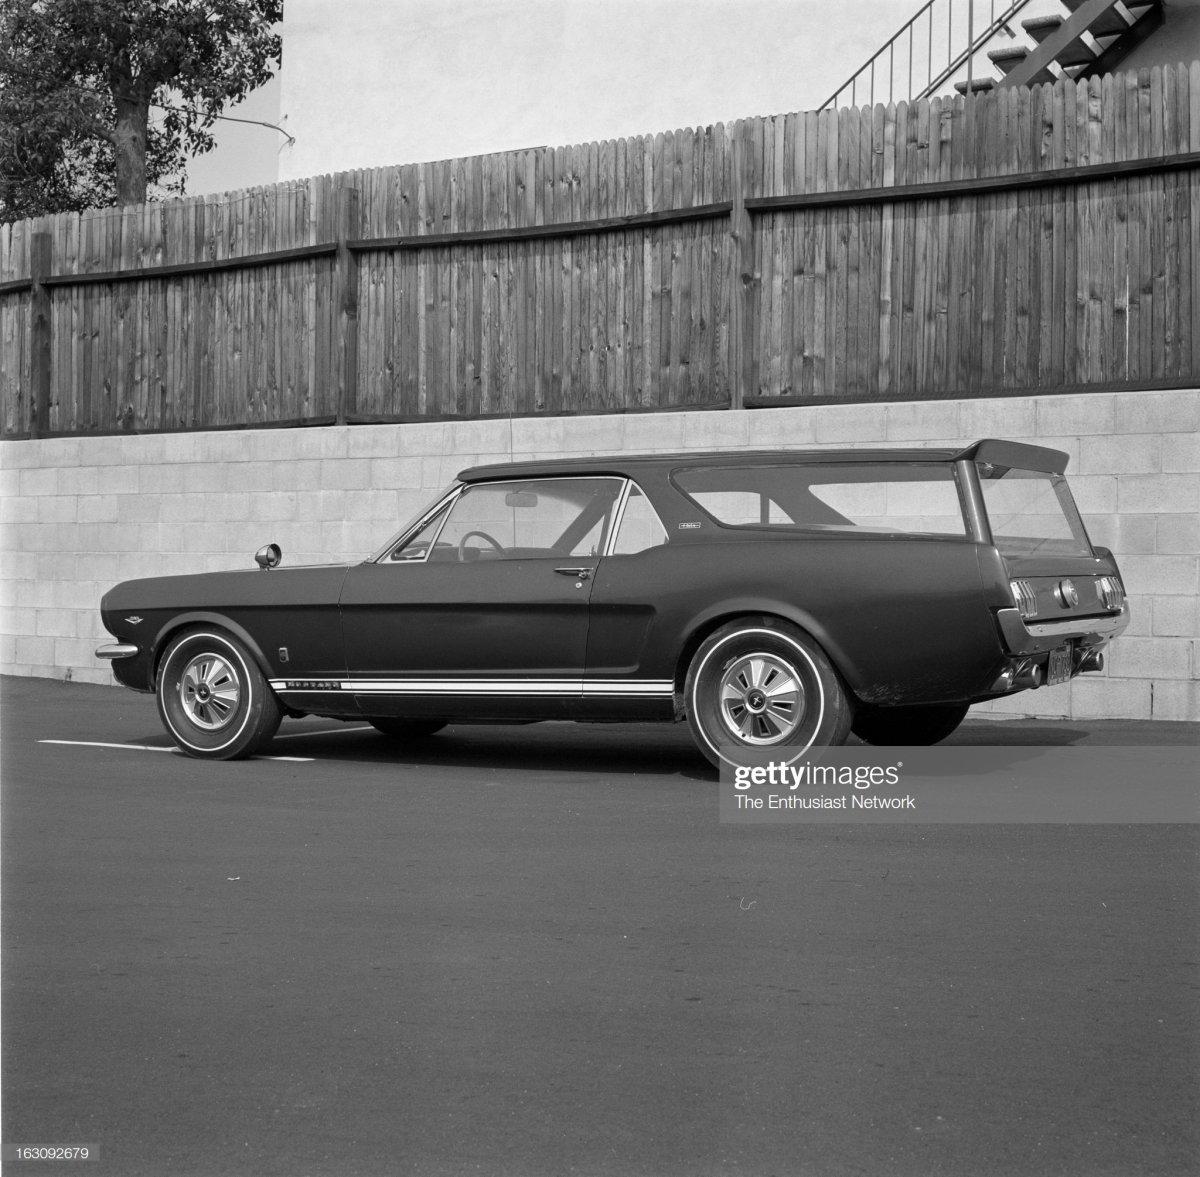 13  1965 Ford Mustang Hobo Wag.jpg